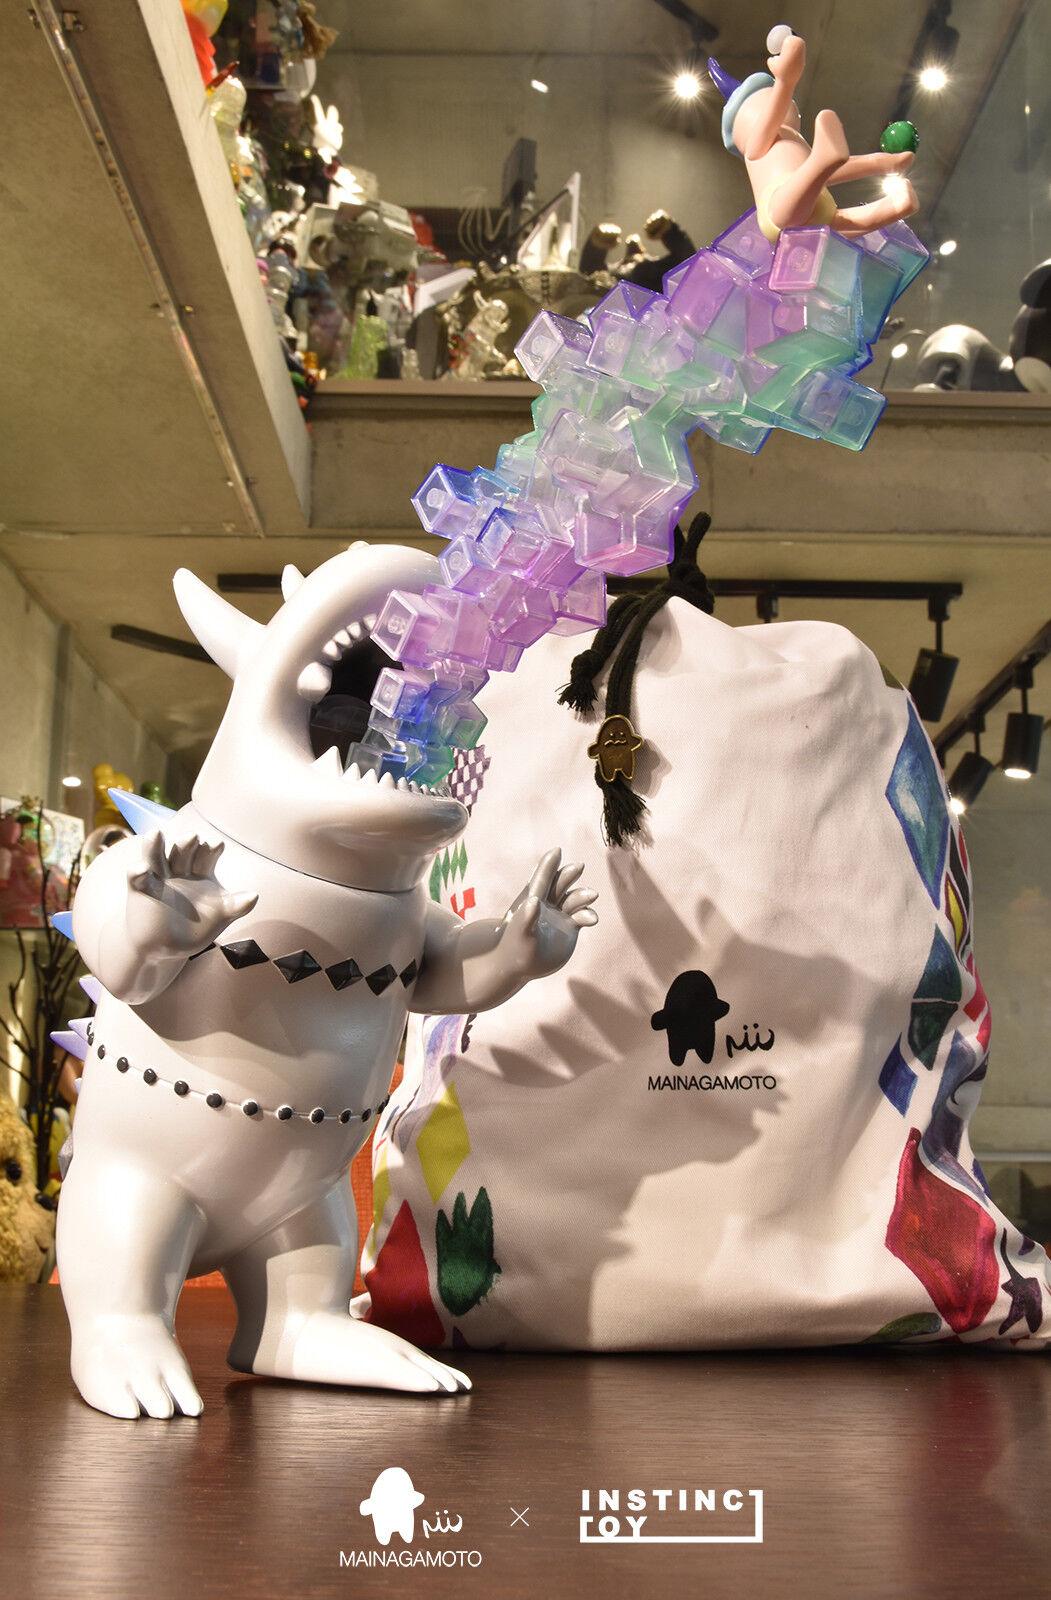 Mai nagamoto × instinctoy inocentes & Core 1st Color inocentes Wonder Festival